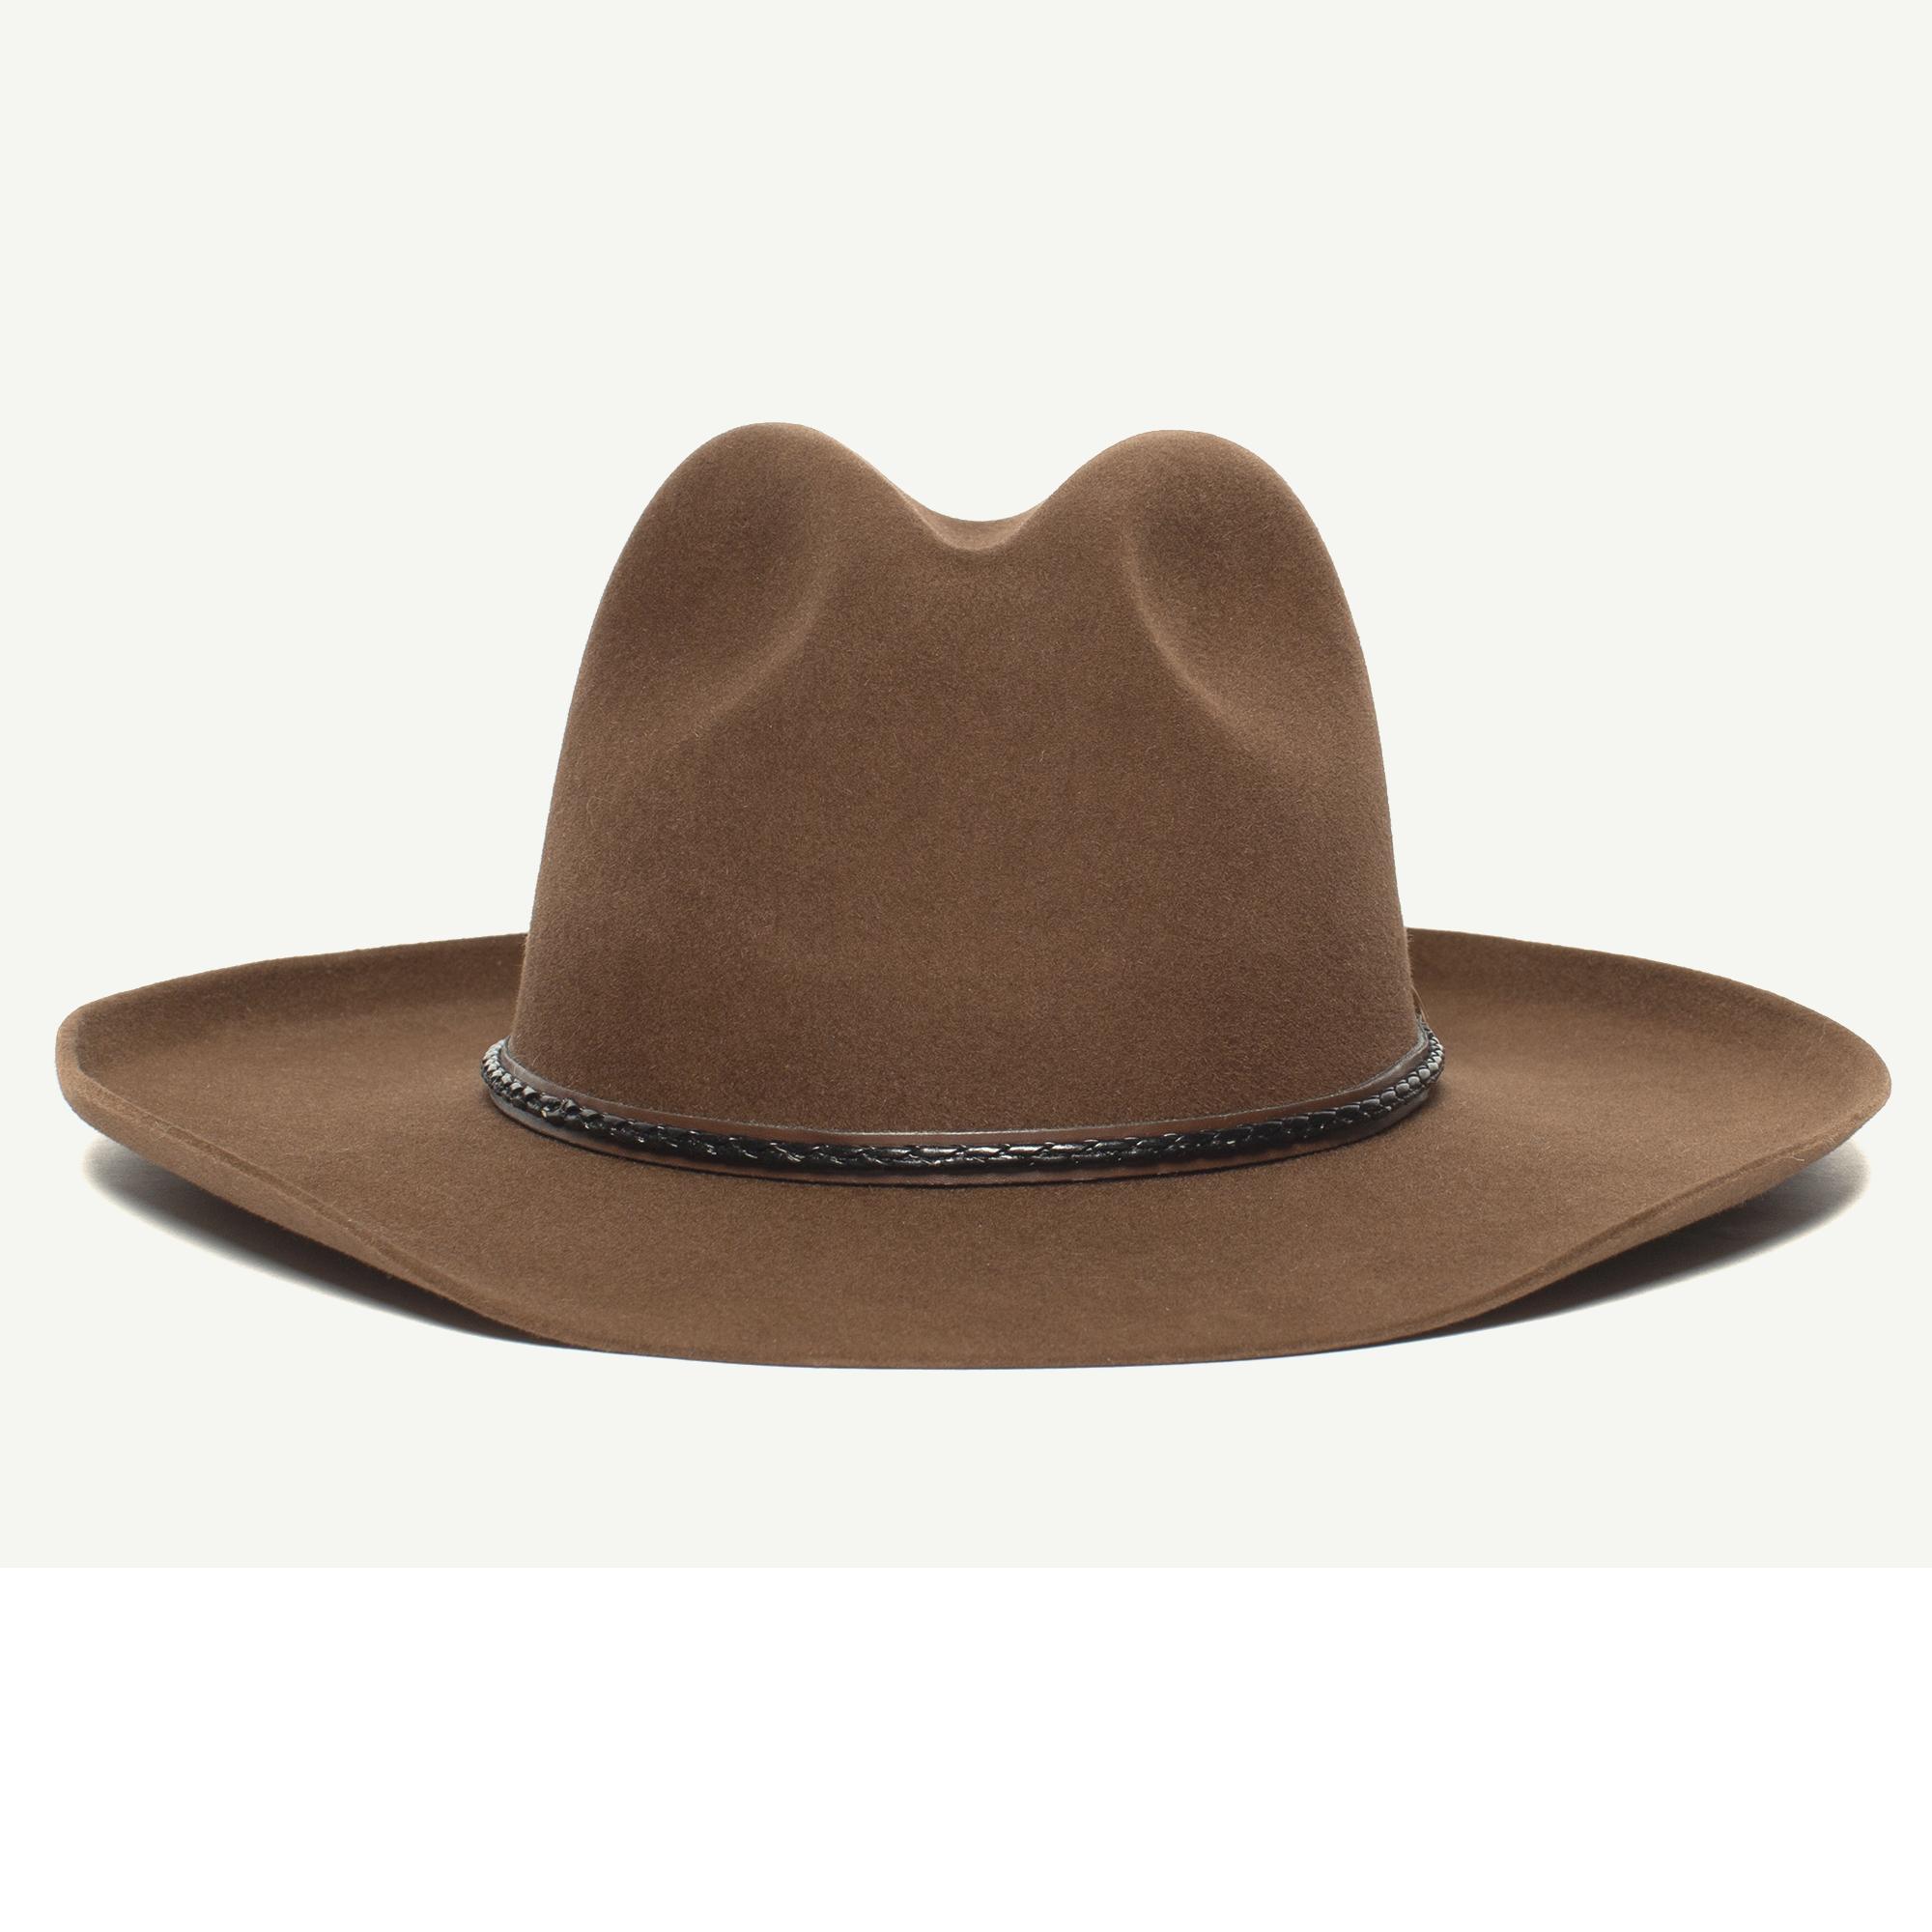 Big Daddy Wide Brim Fedora Hats For Men Fashion Boots